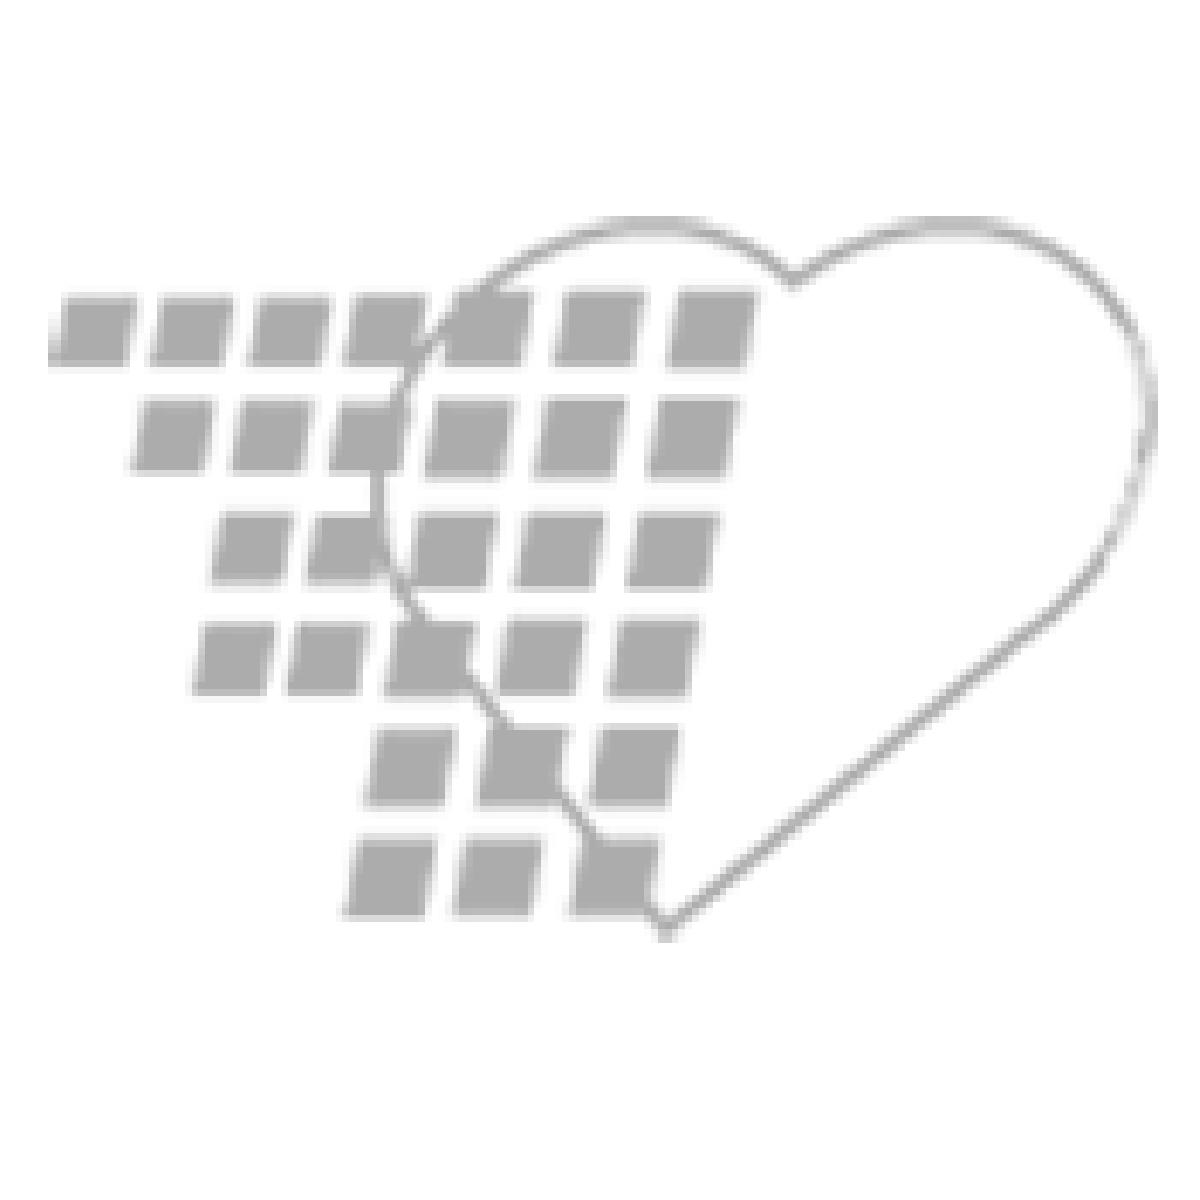 04-76-6800-REFURB - Refurbished Hill-Rom Procedural Stretcher